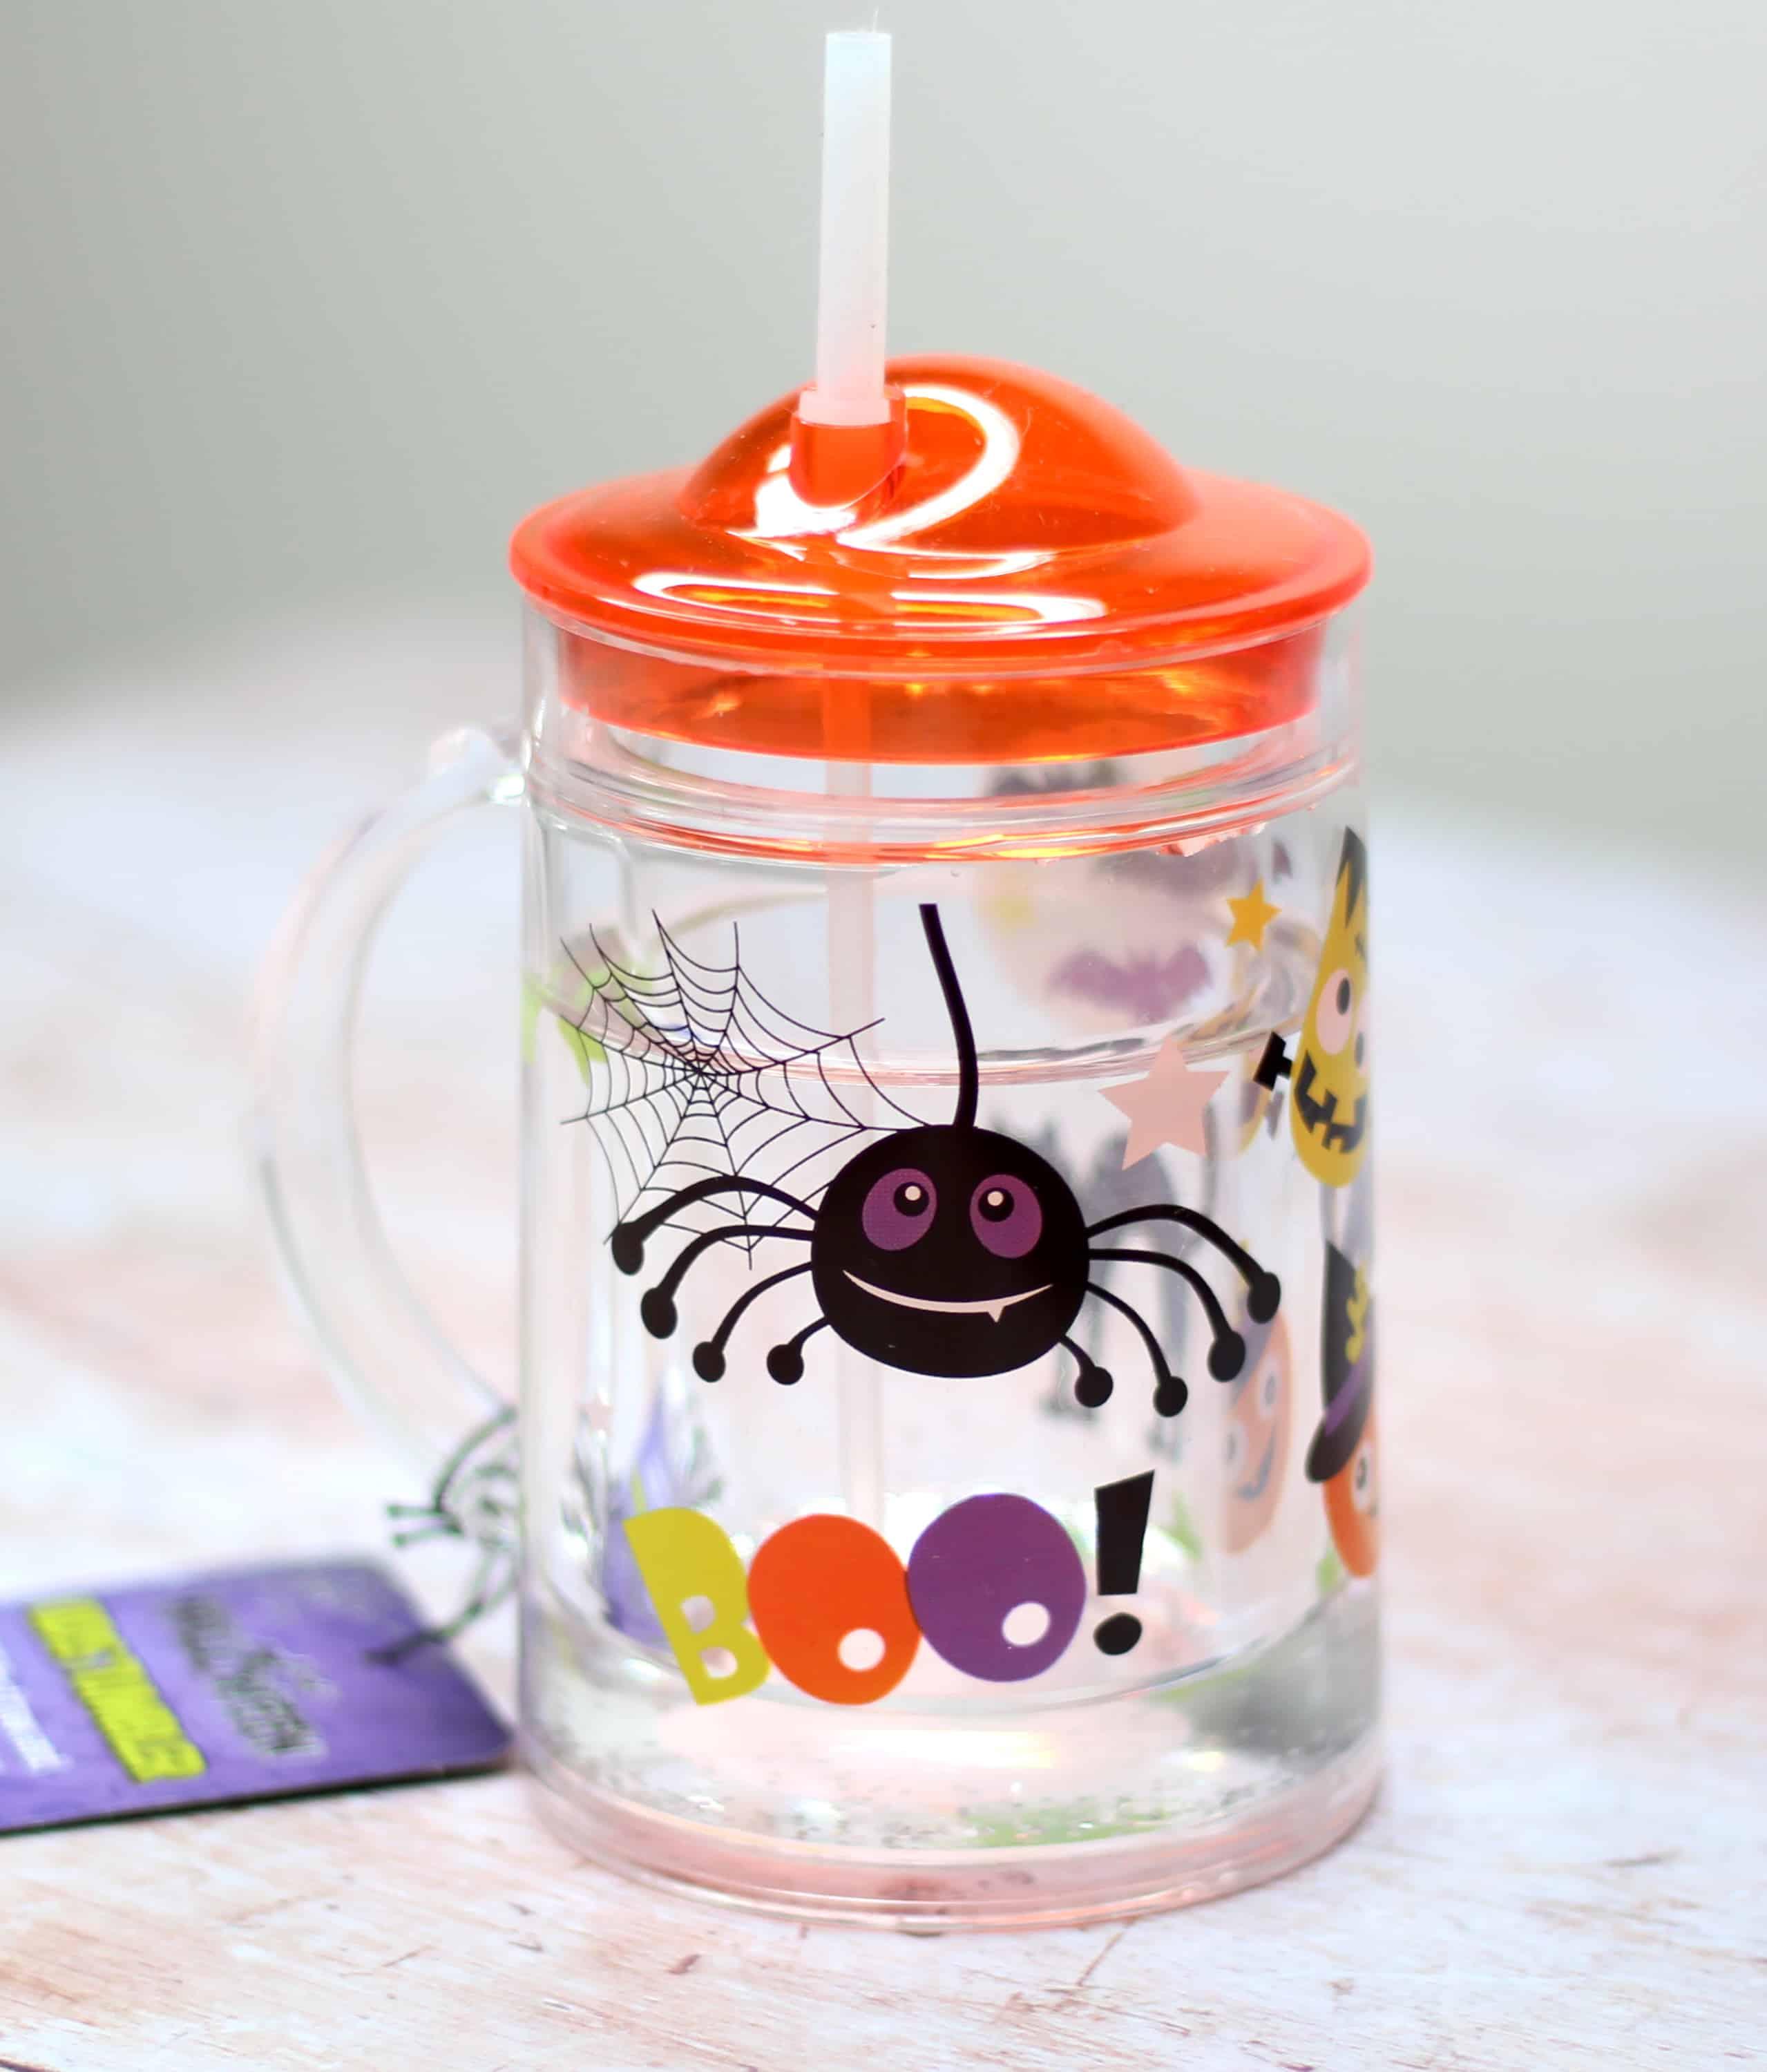 Home Bargains Halloween Essentials - Under £4.00 each - Soph-obsessed